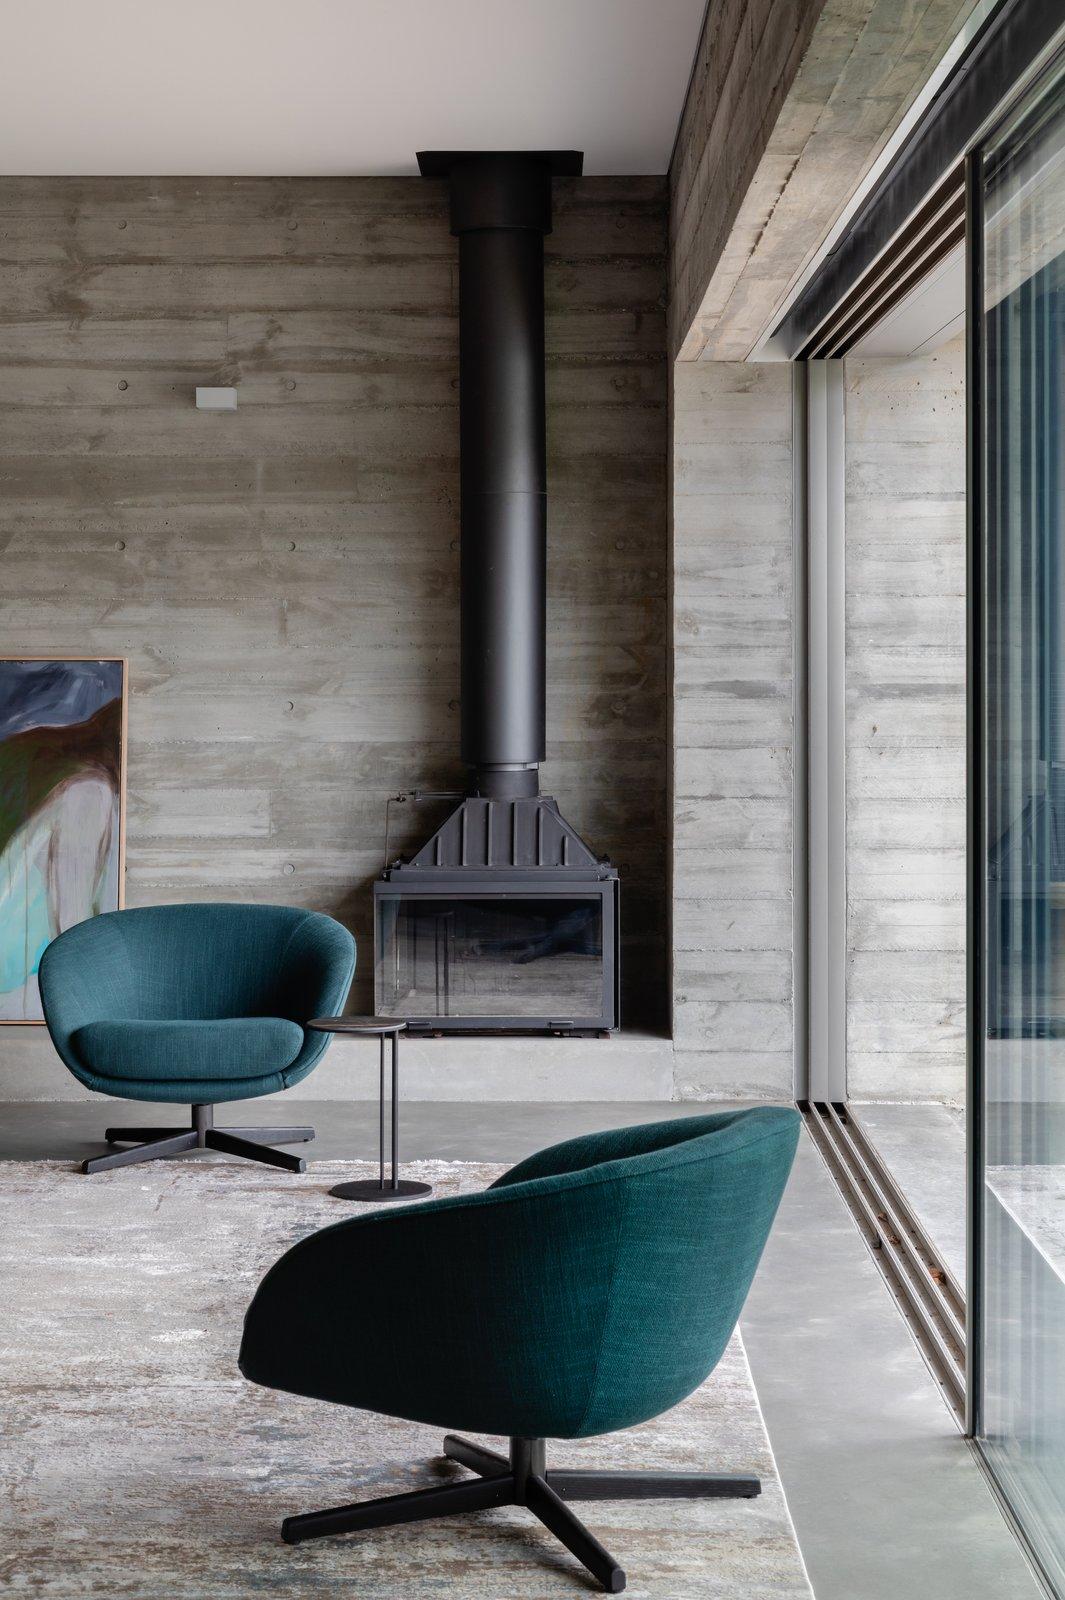 Living room at Church Point House by CHROFI.